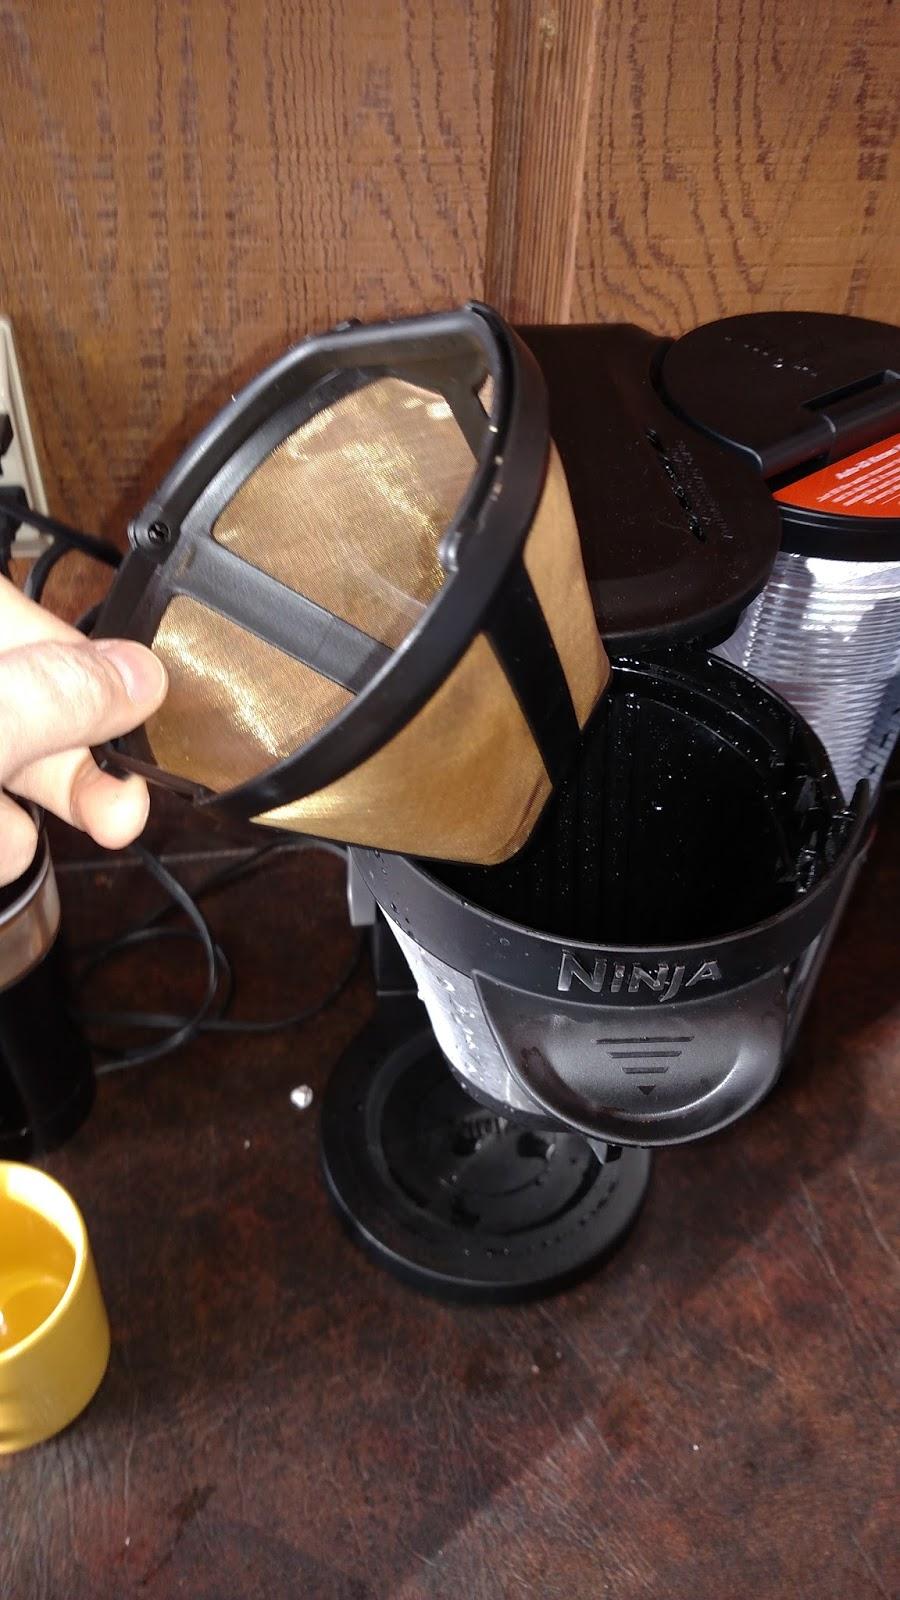 Ninja Coffeemaker Review | Coffee Maker Journal